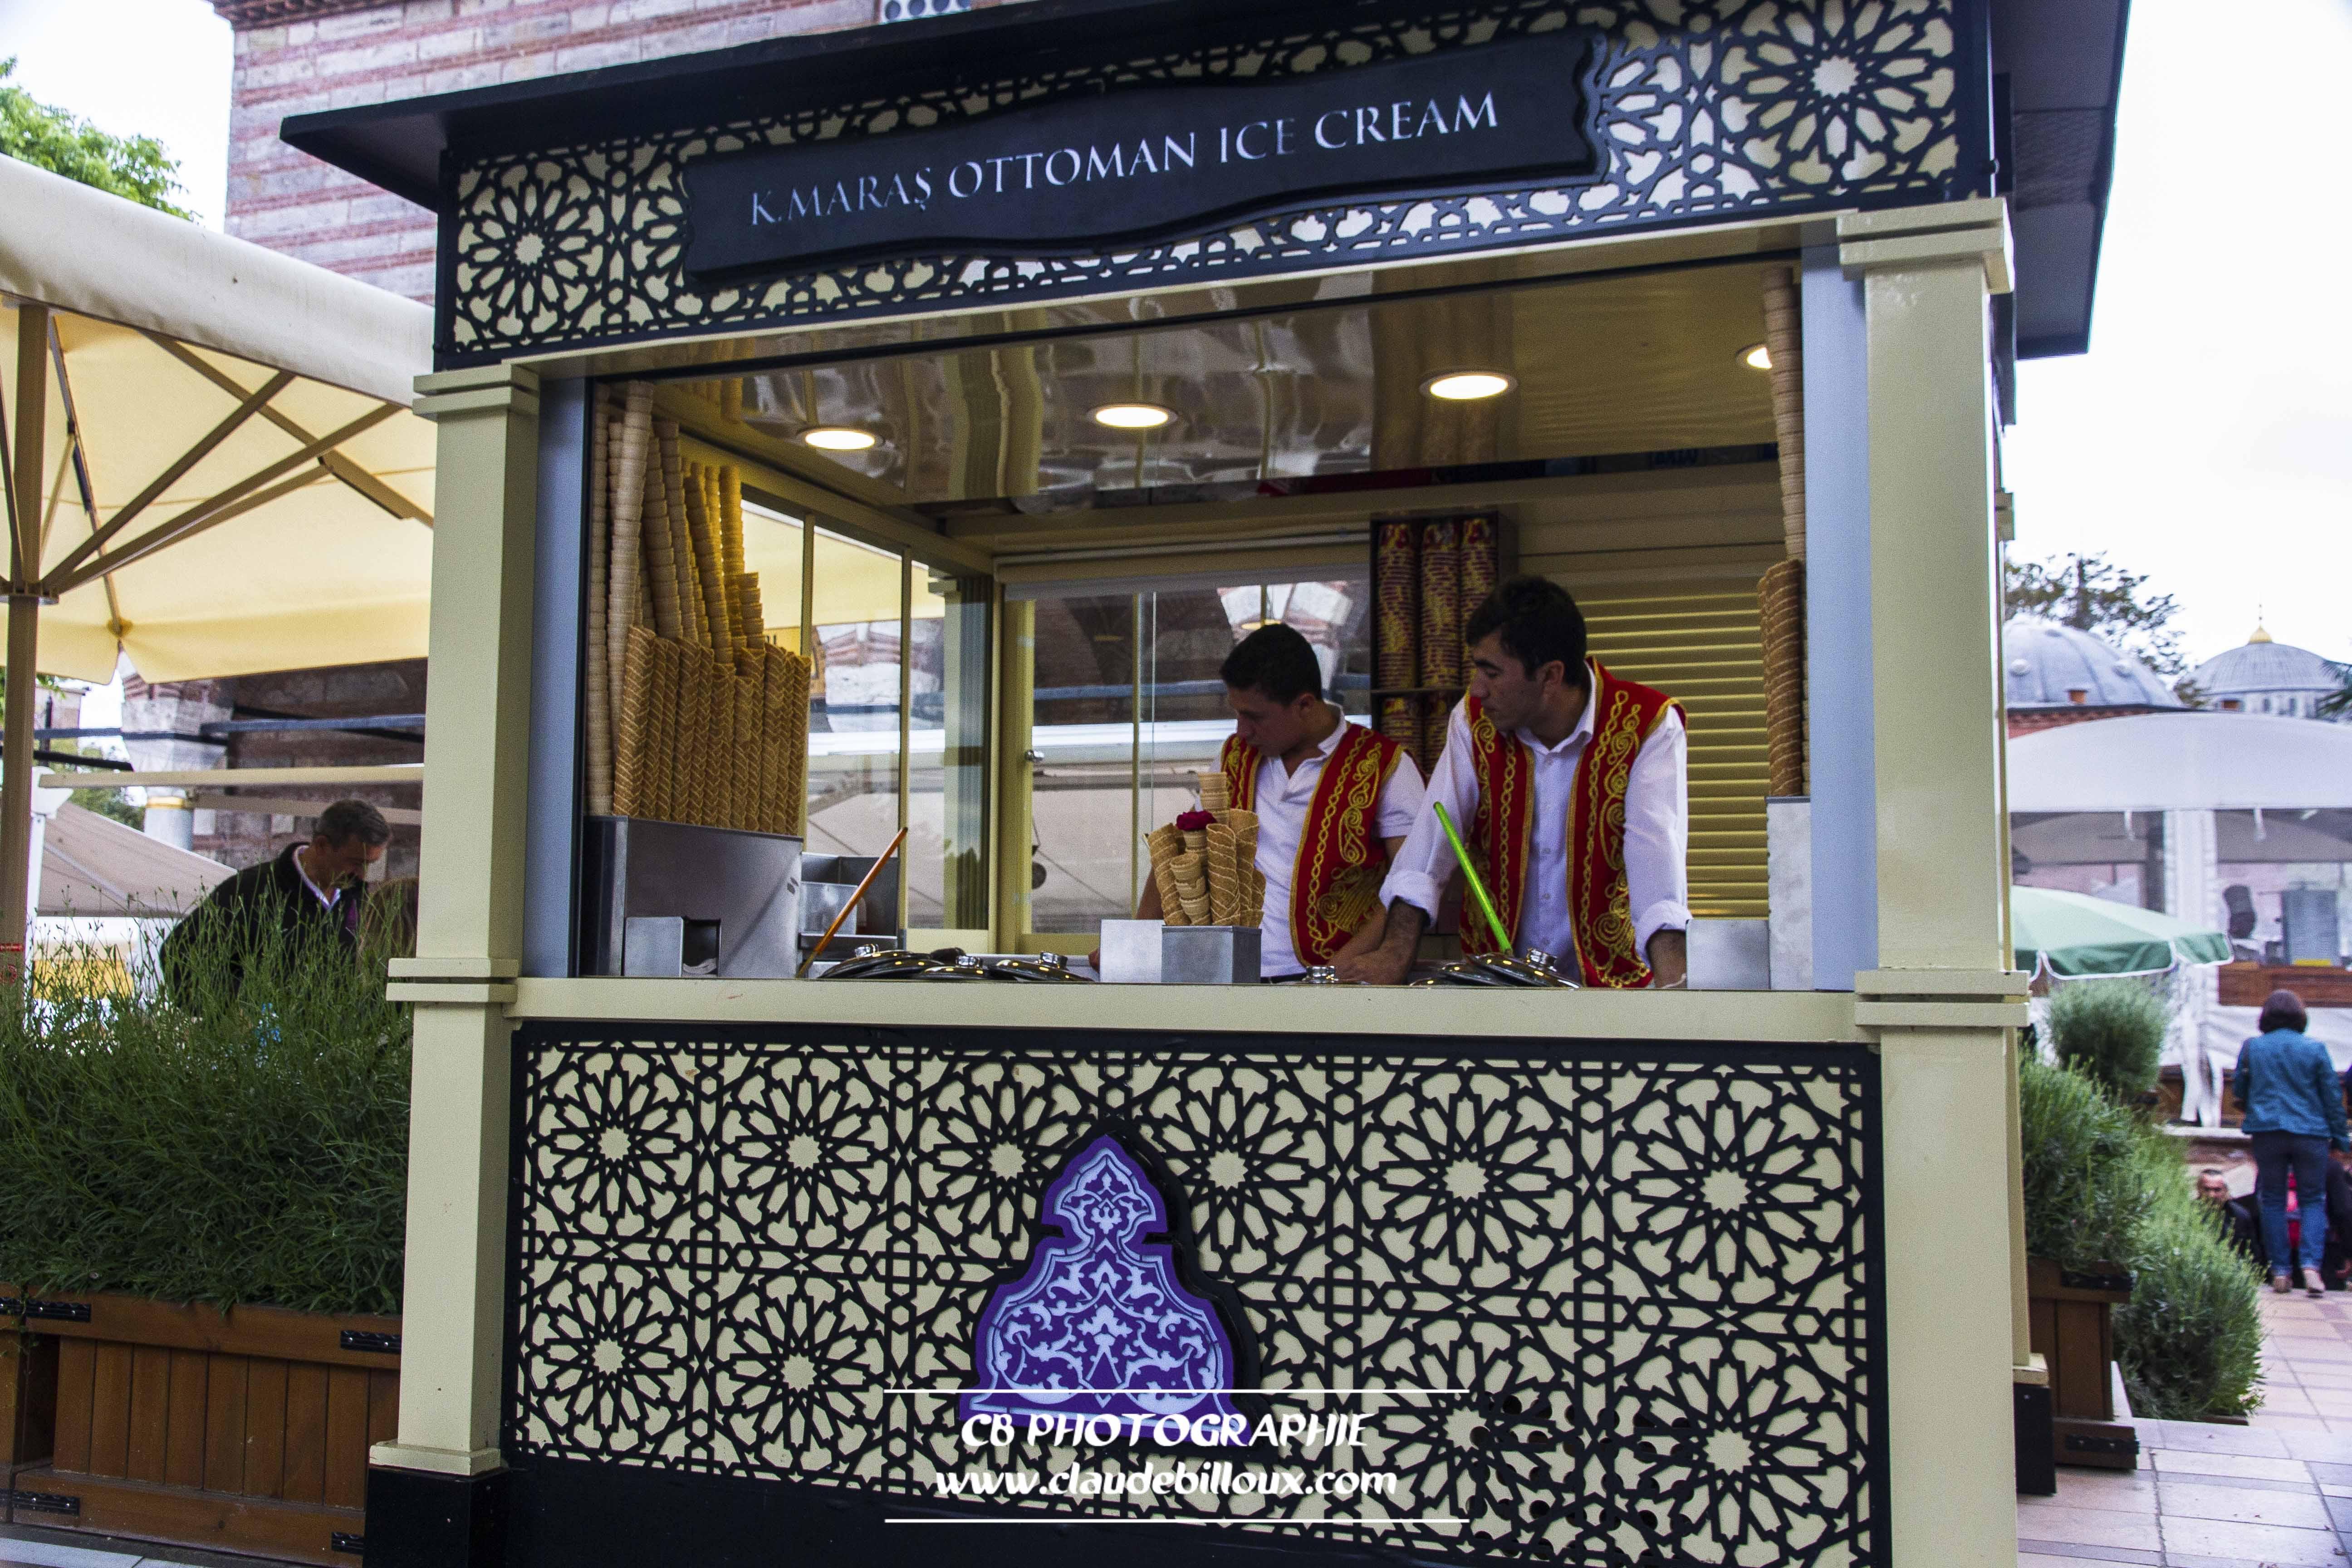 Marchande de glaces en costume